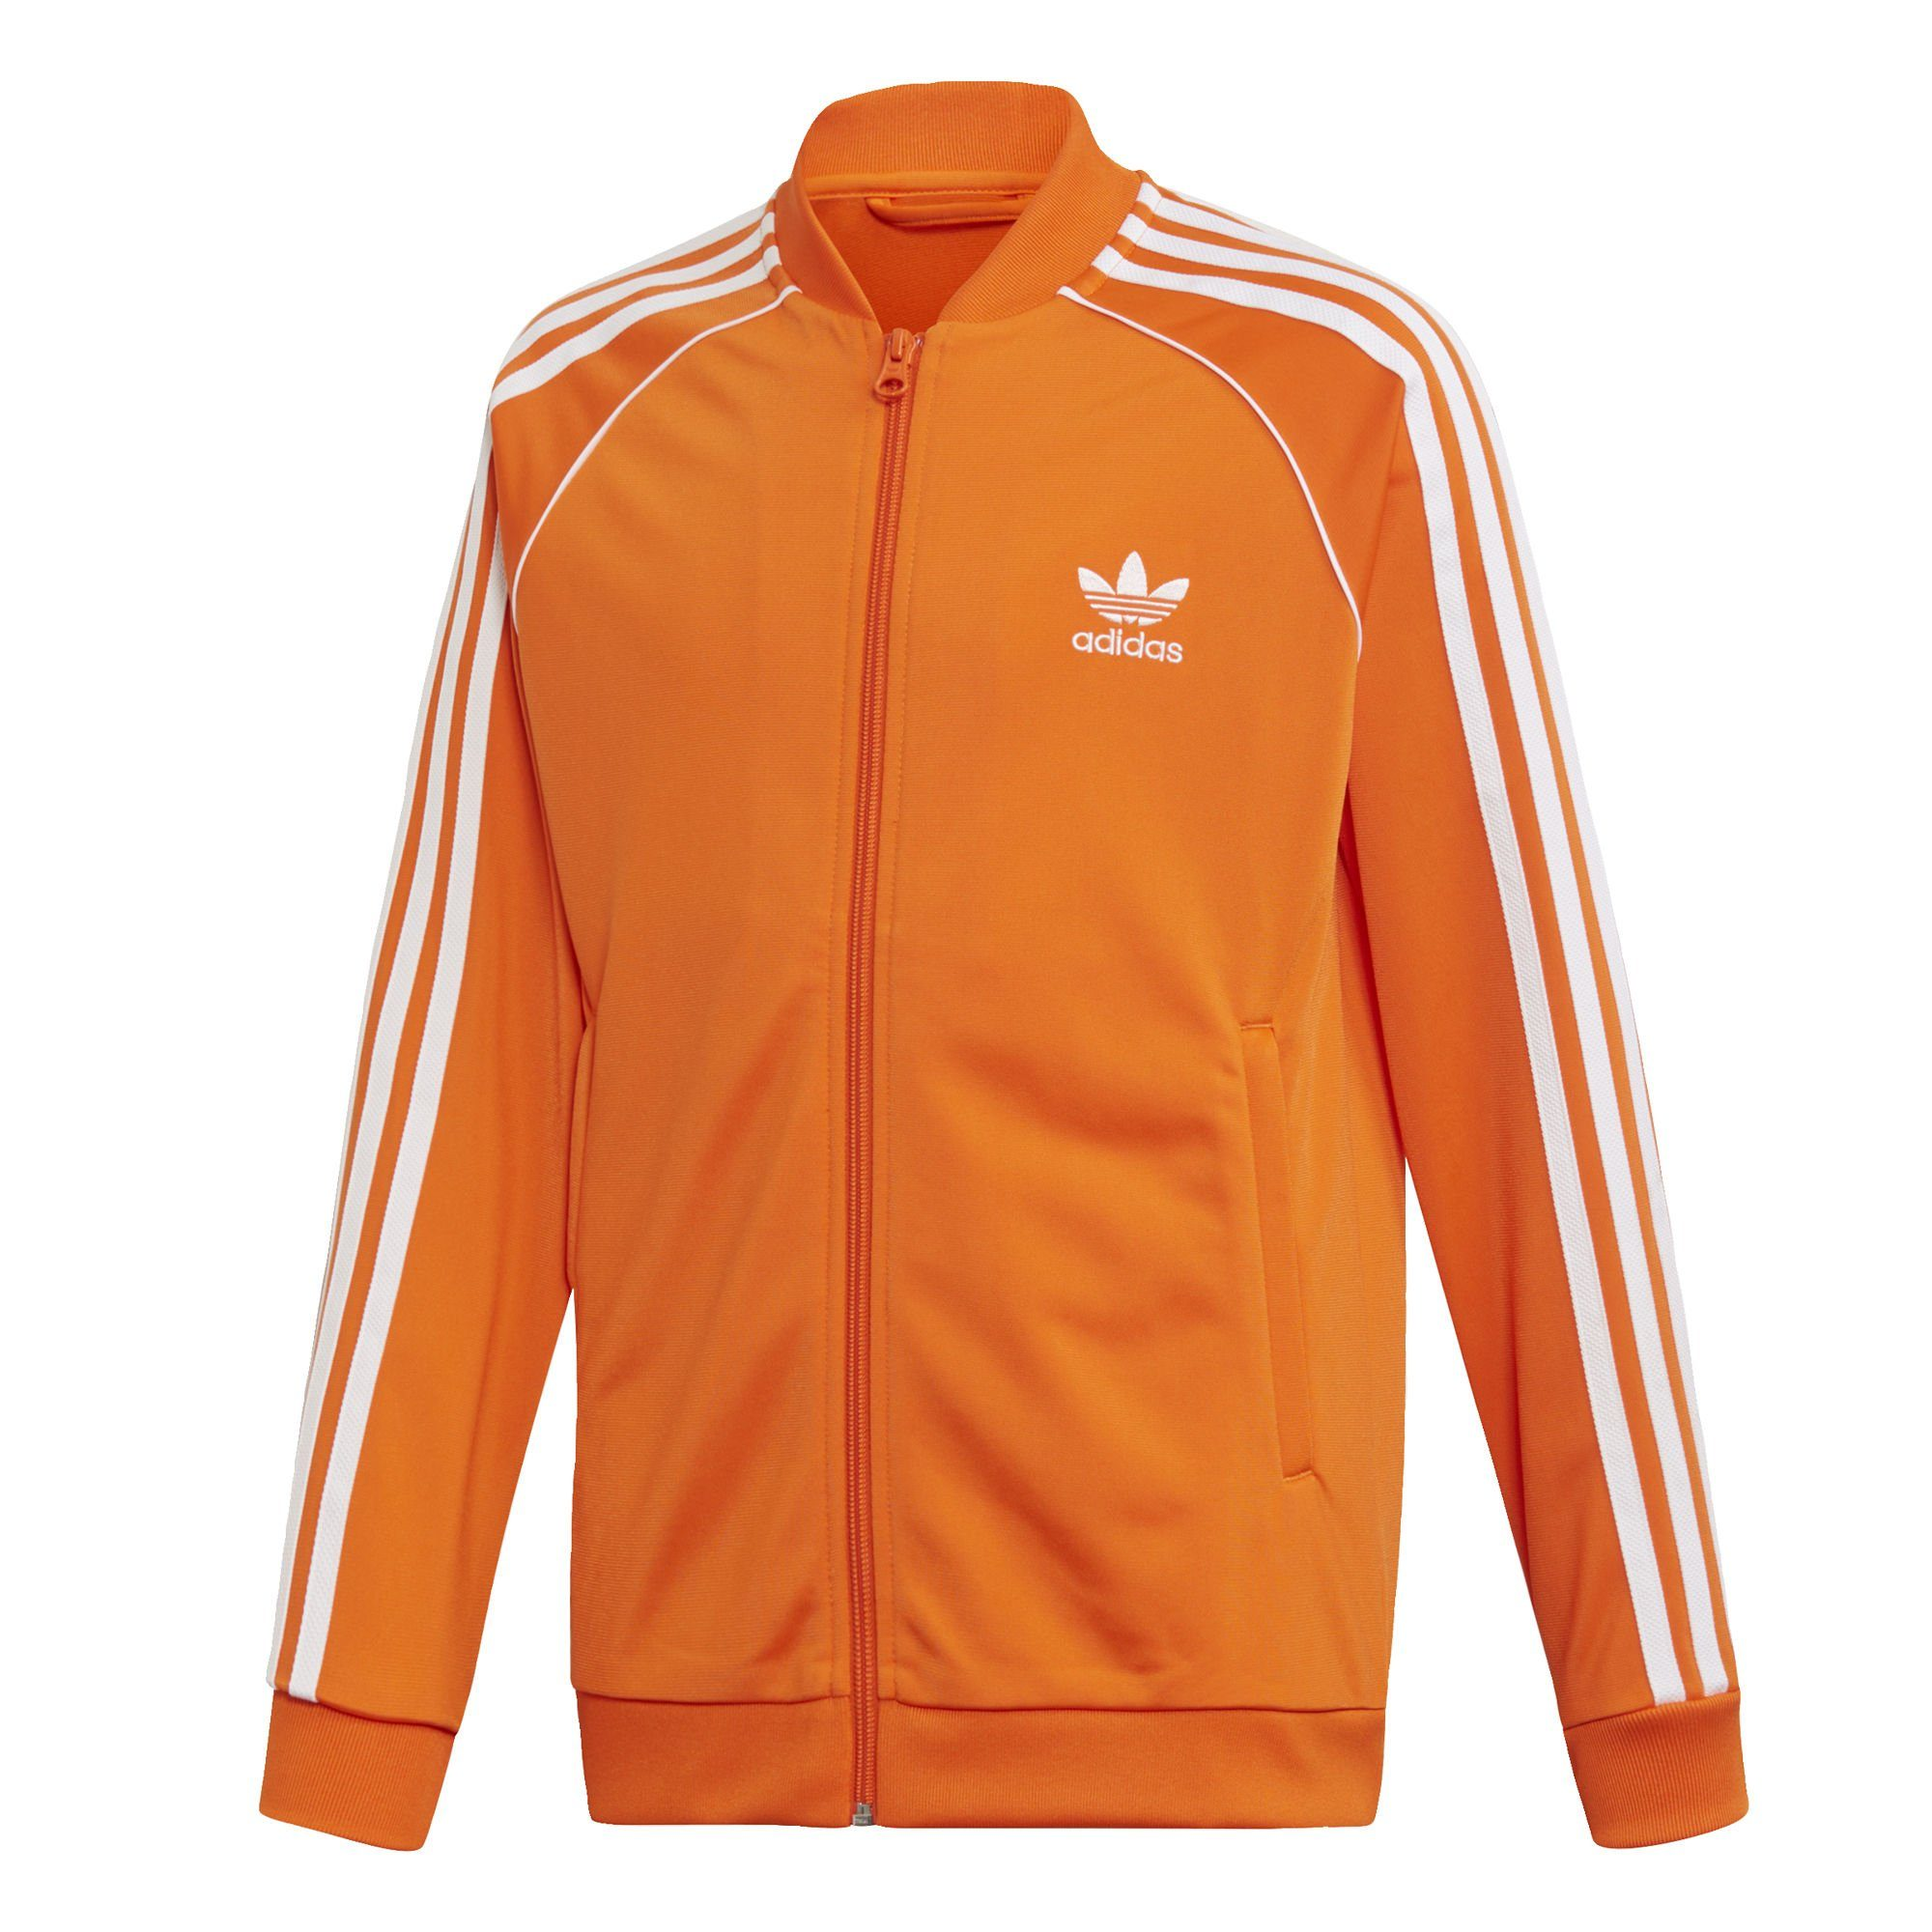 adidas Originals Trainingsanzug »SST Originals Jacke«, adicolor online kaufen | OTTO